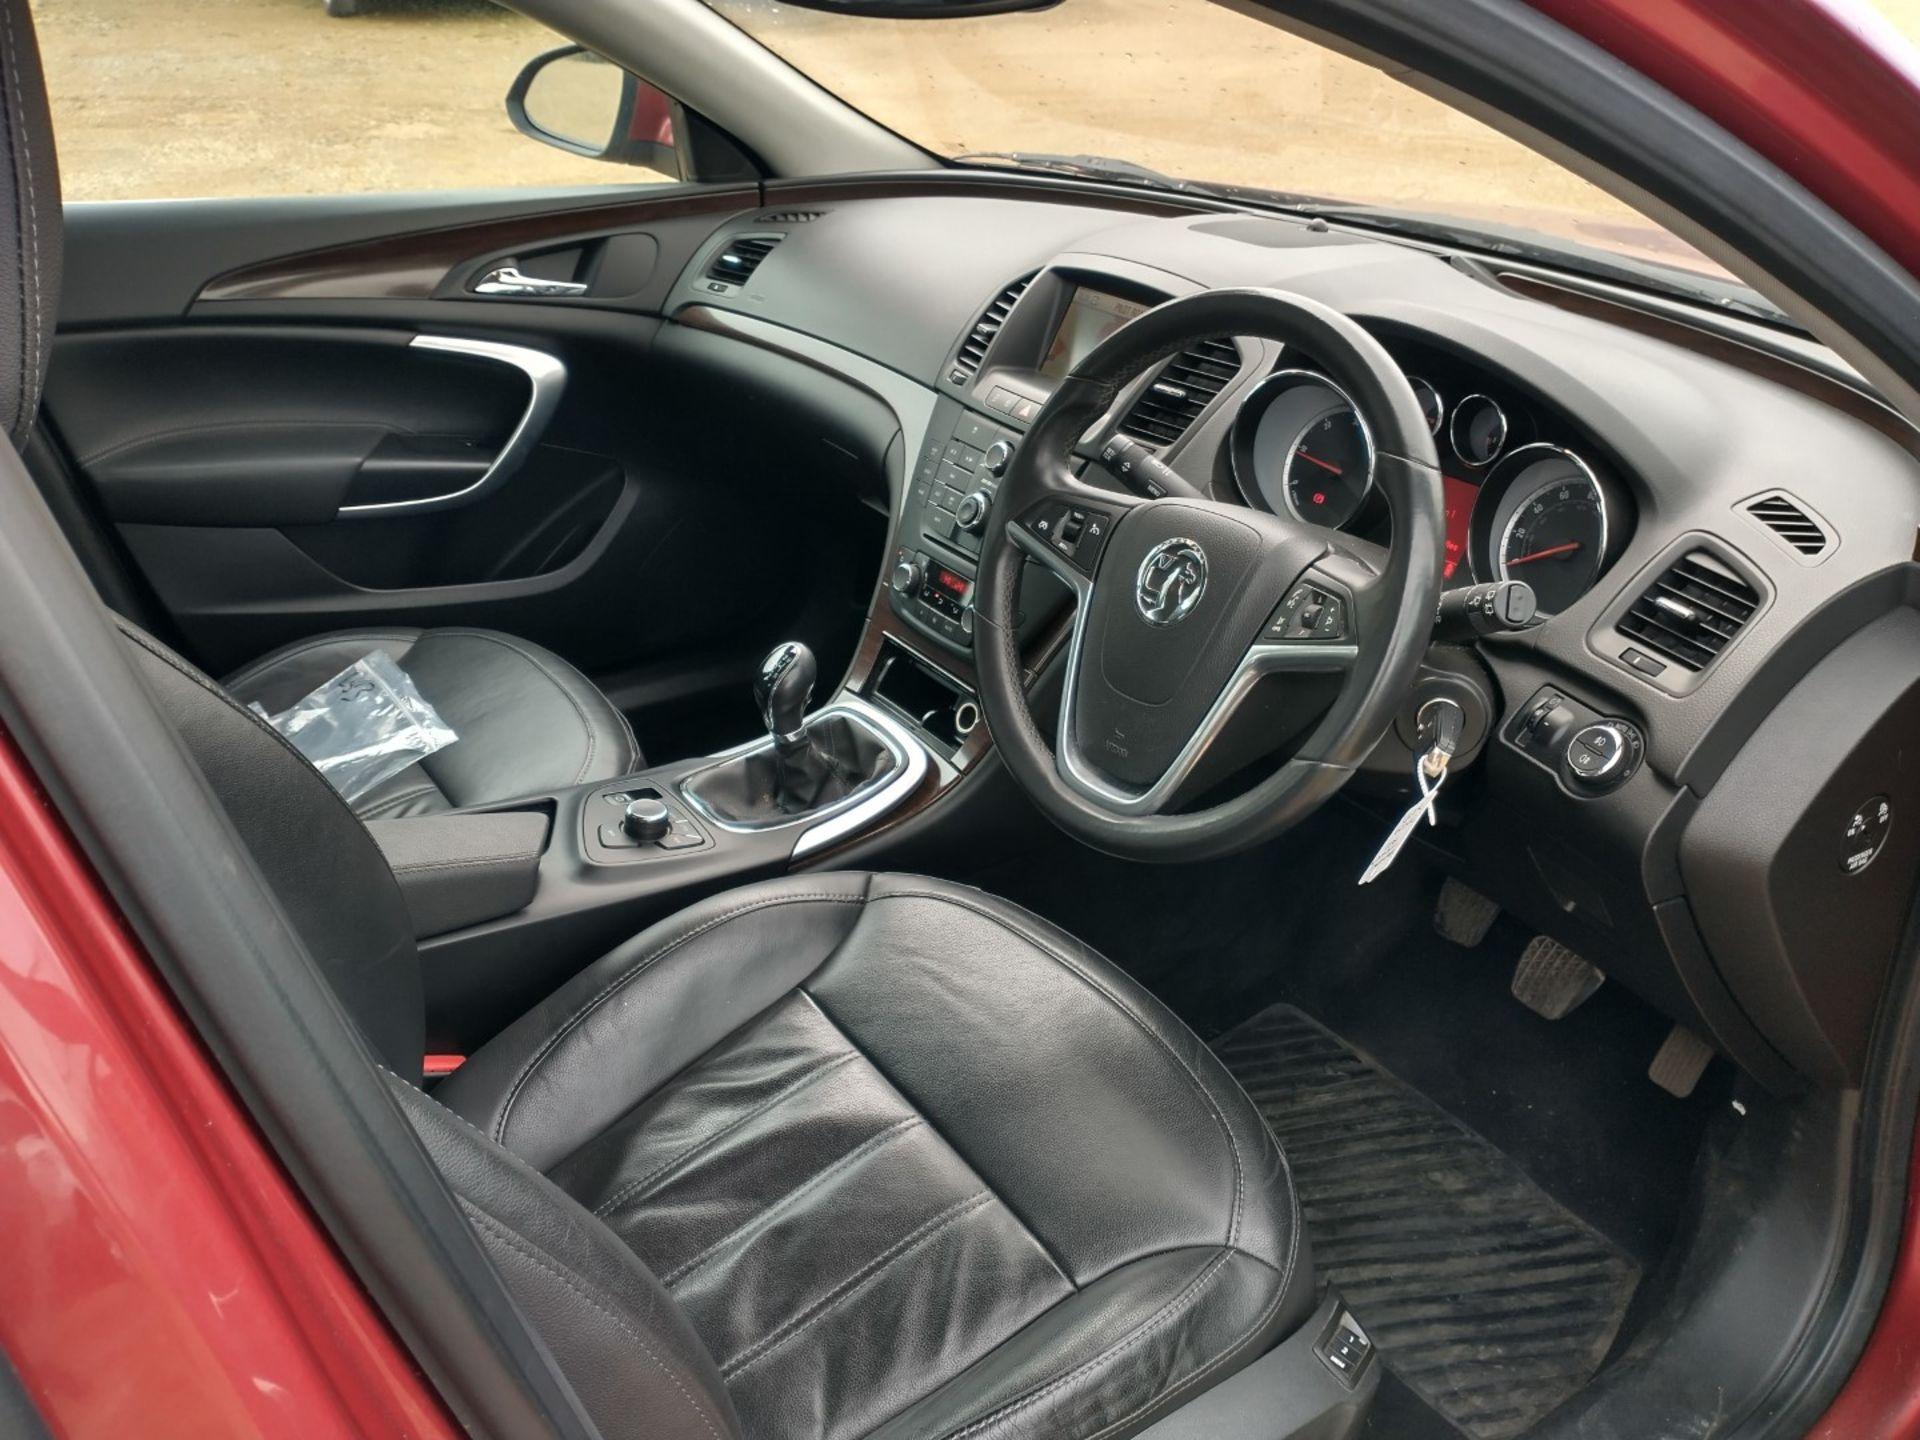 2009 Vauxhall Insignia Elite Nav CDTI 5dr 2.0 Diesel - CL505 - NO VAT ON THE HAMMER - Location: Corb - Image 16 of 22